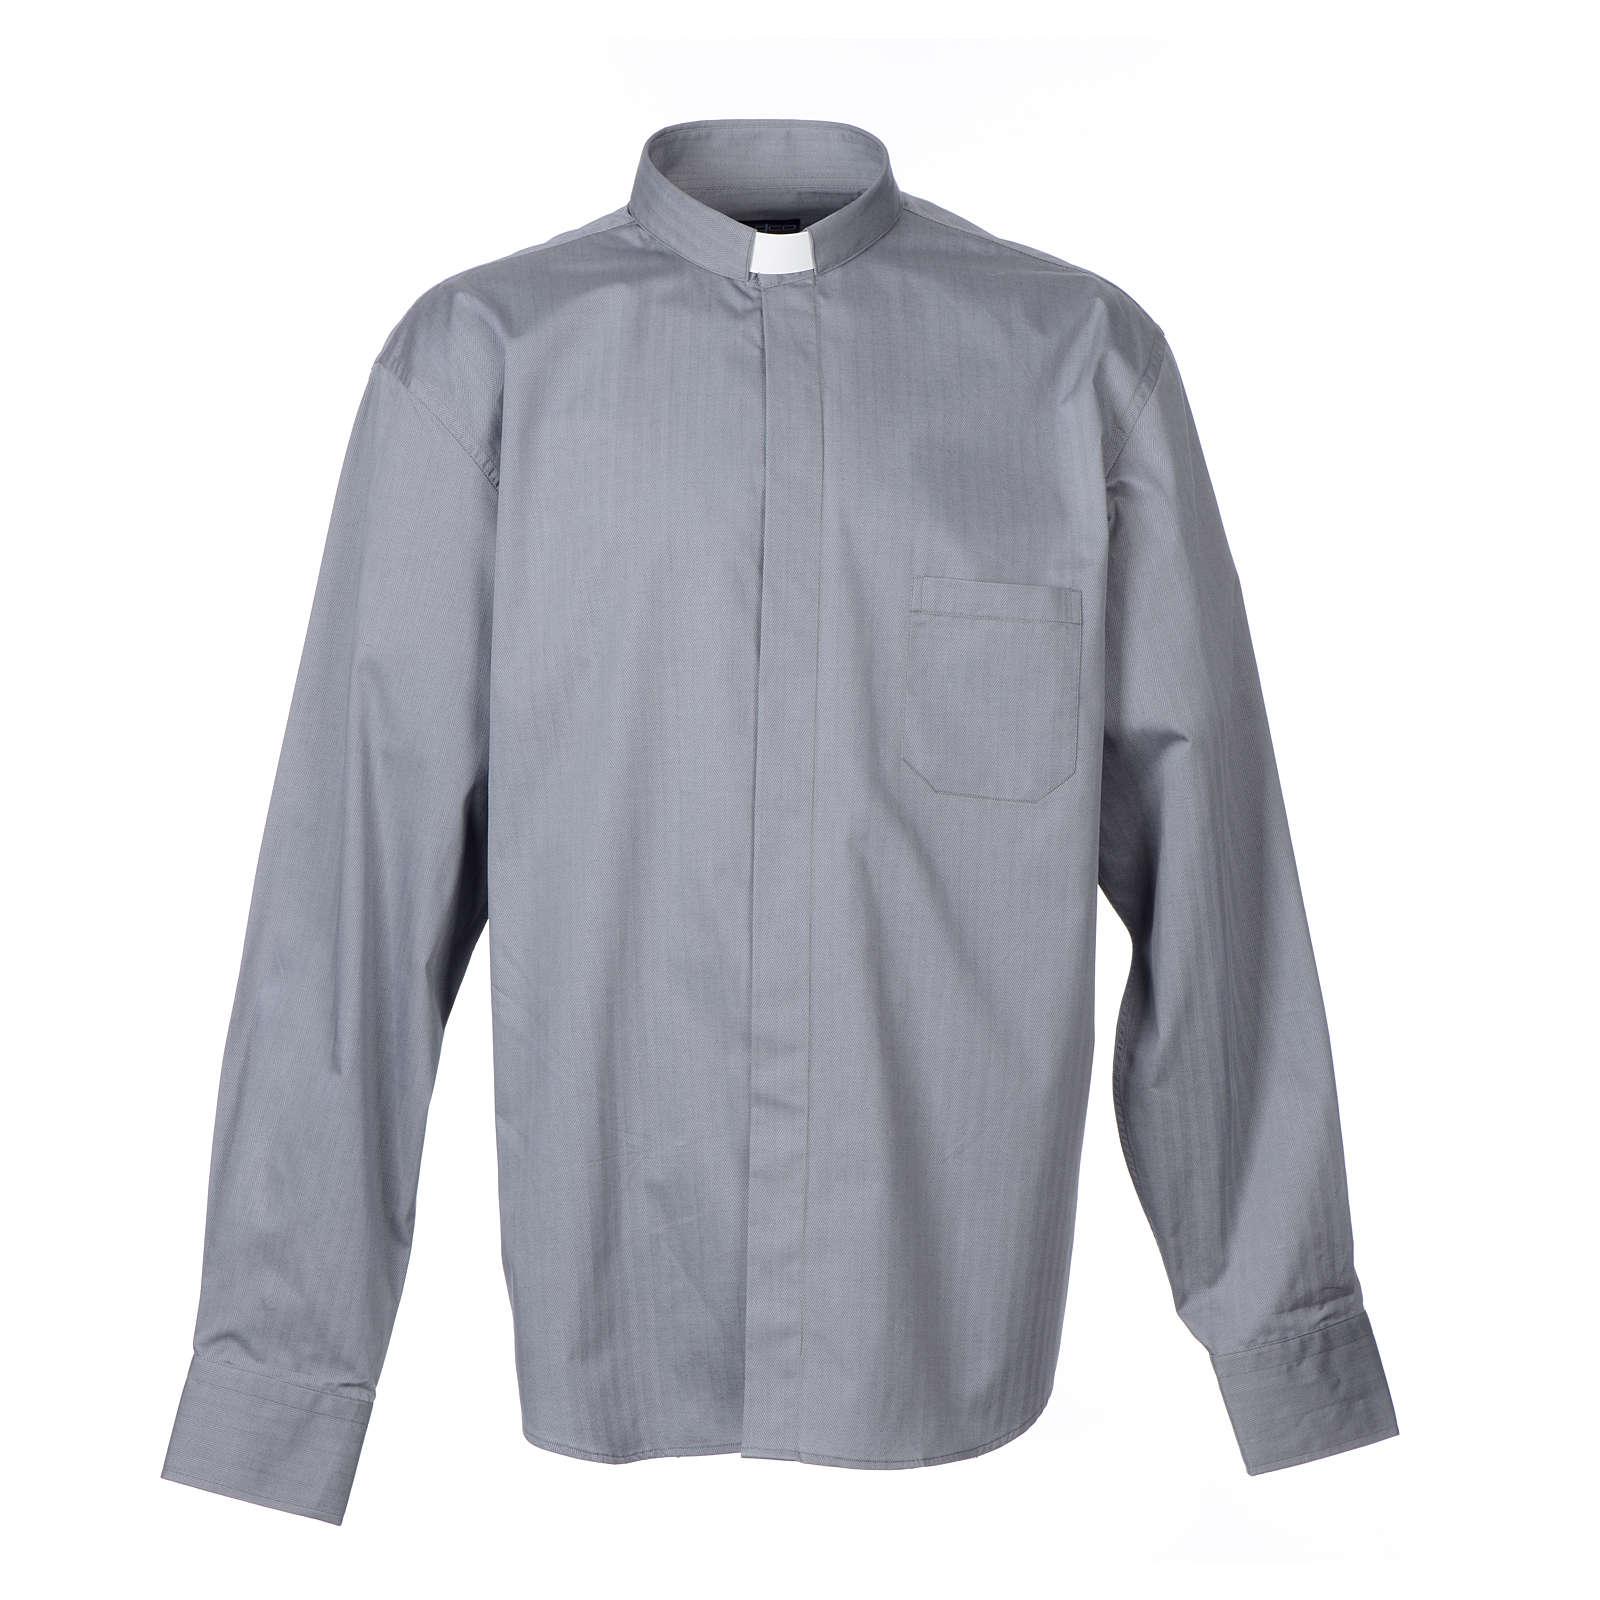 Clergy Collar Grey Shirt long sleeve easy-iron mixed herringbone cotton 4